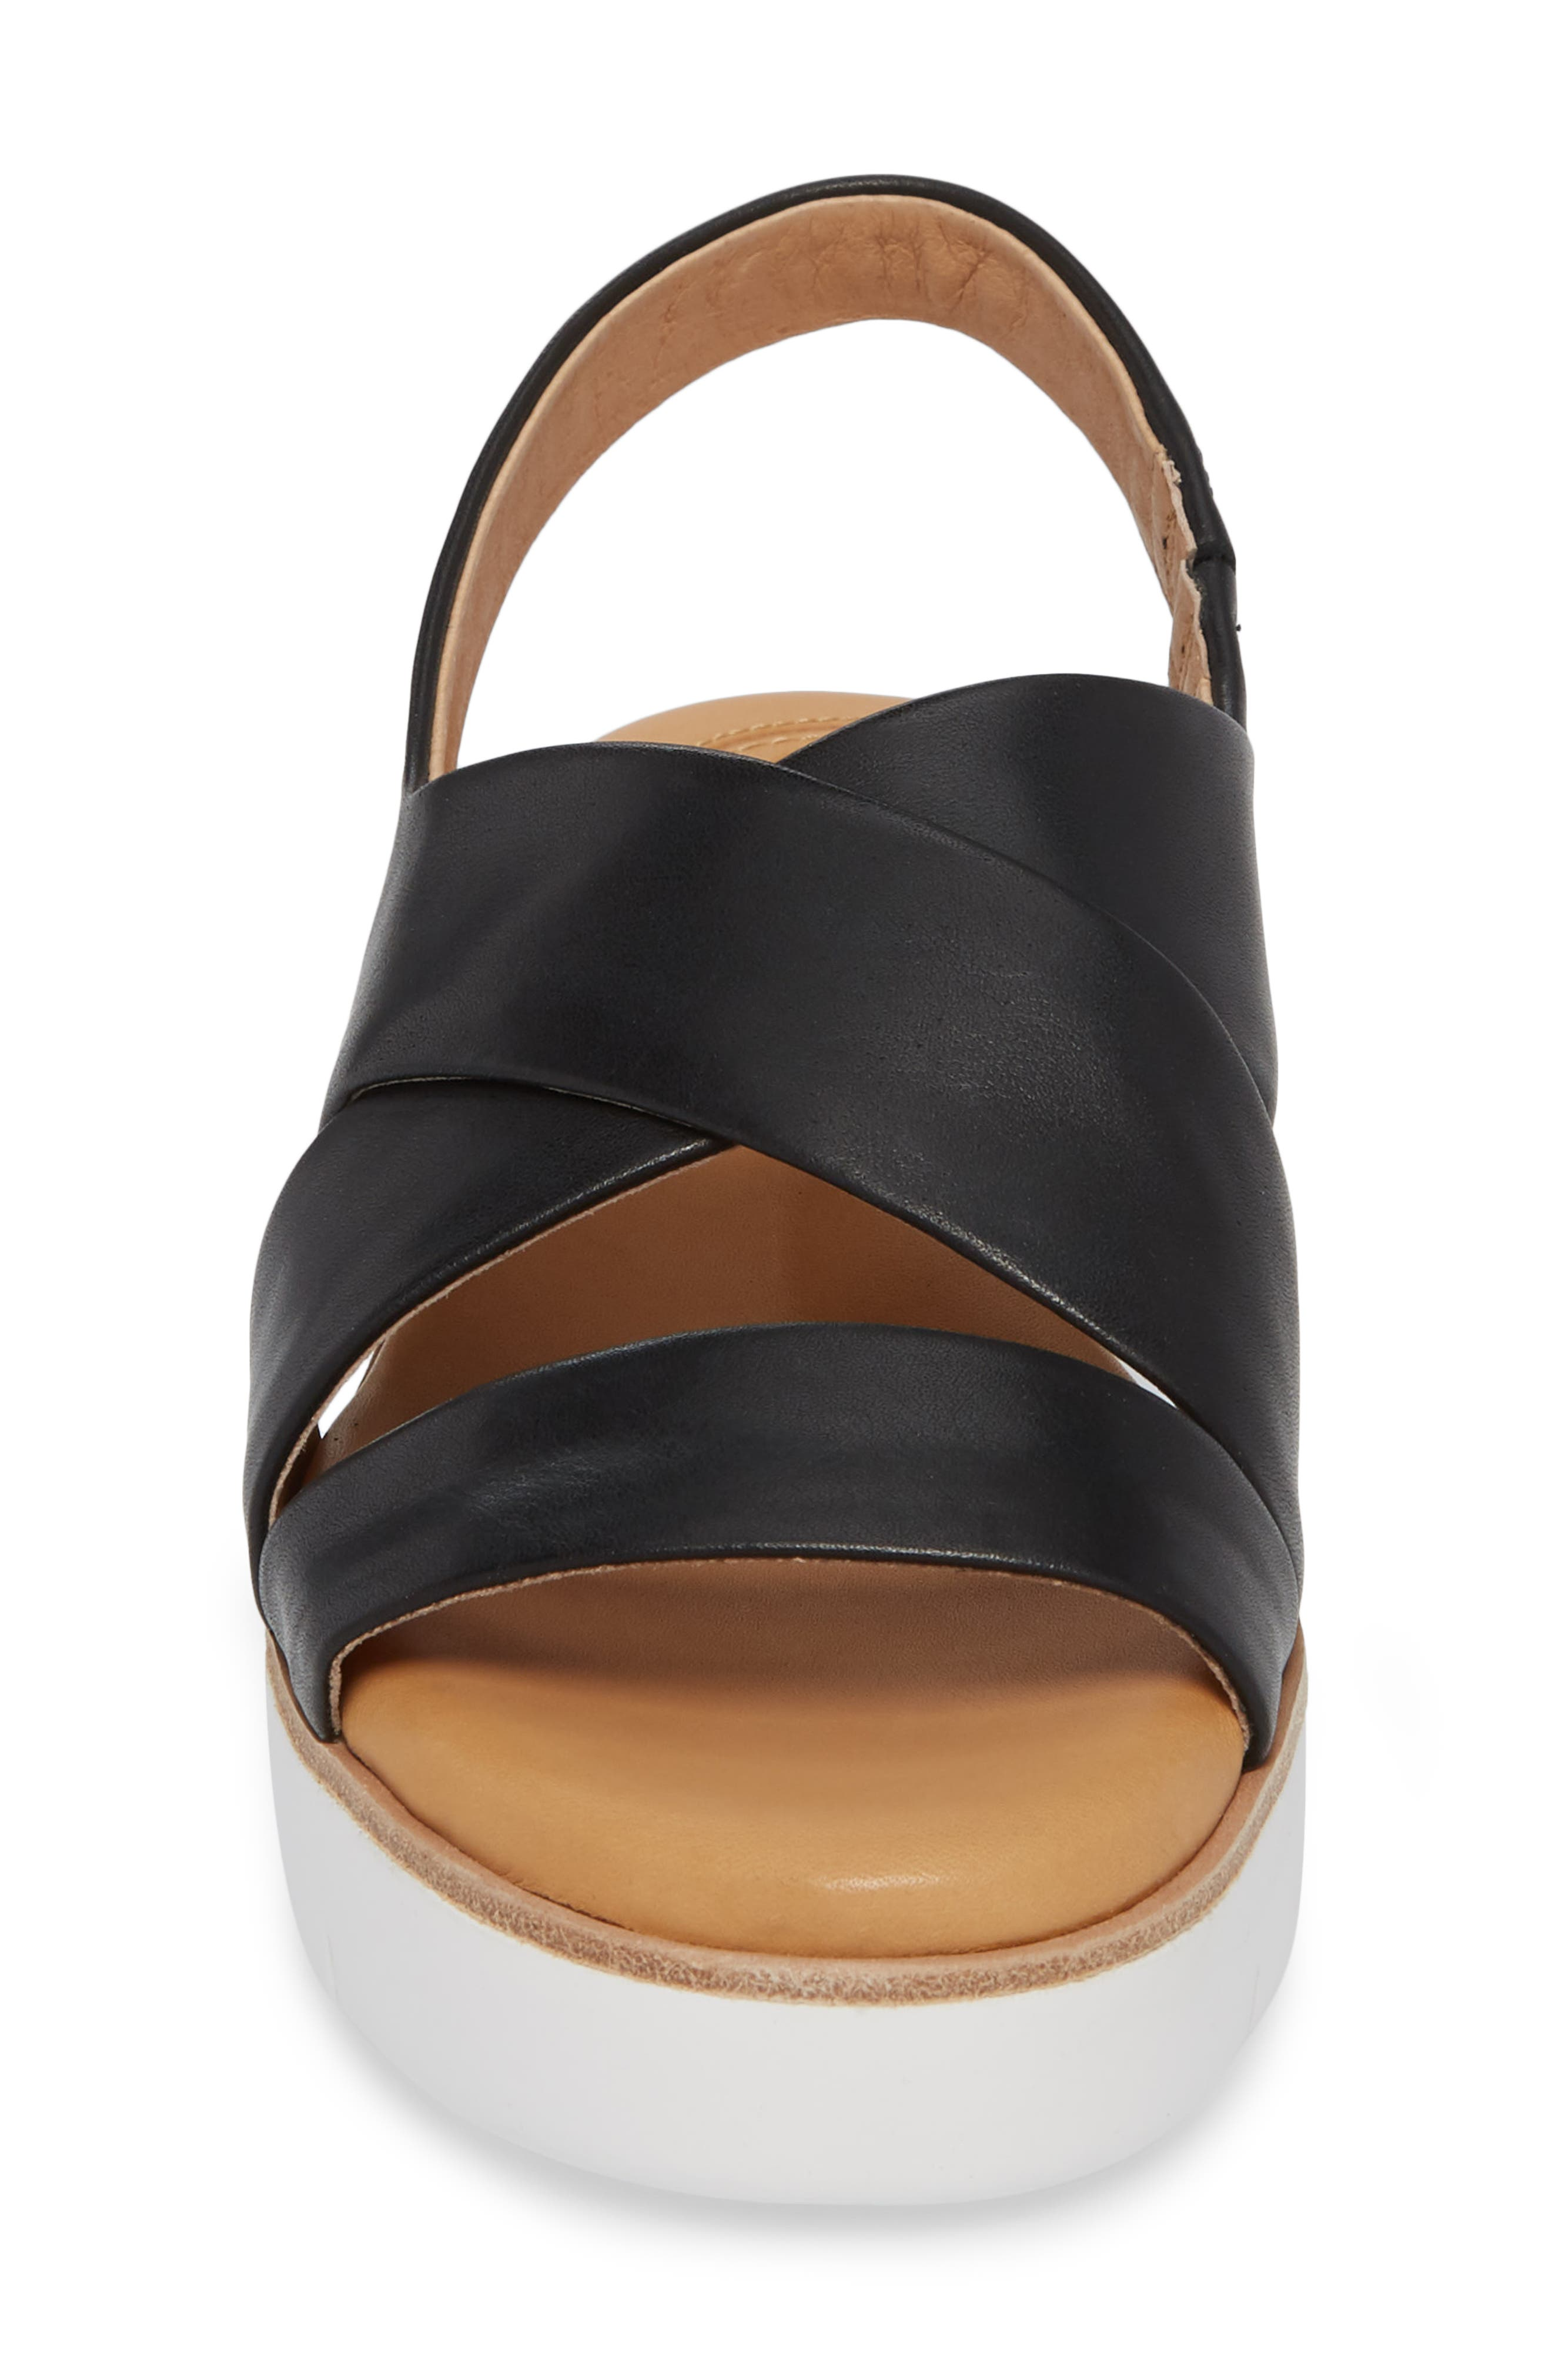 Brinney Wedge Sandal,                             Alternate thumbnail 4, color,                             BLACK LEATHER